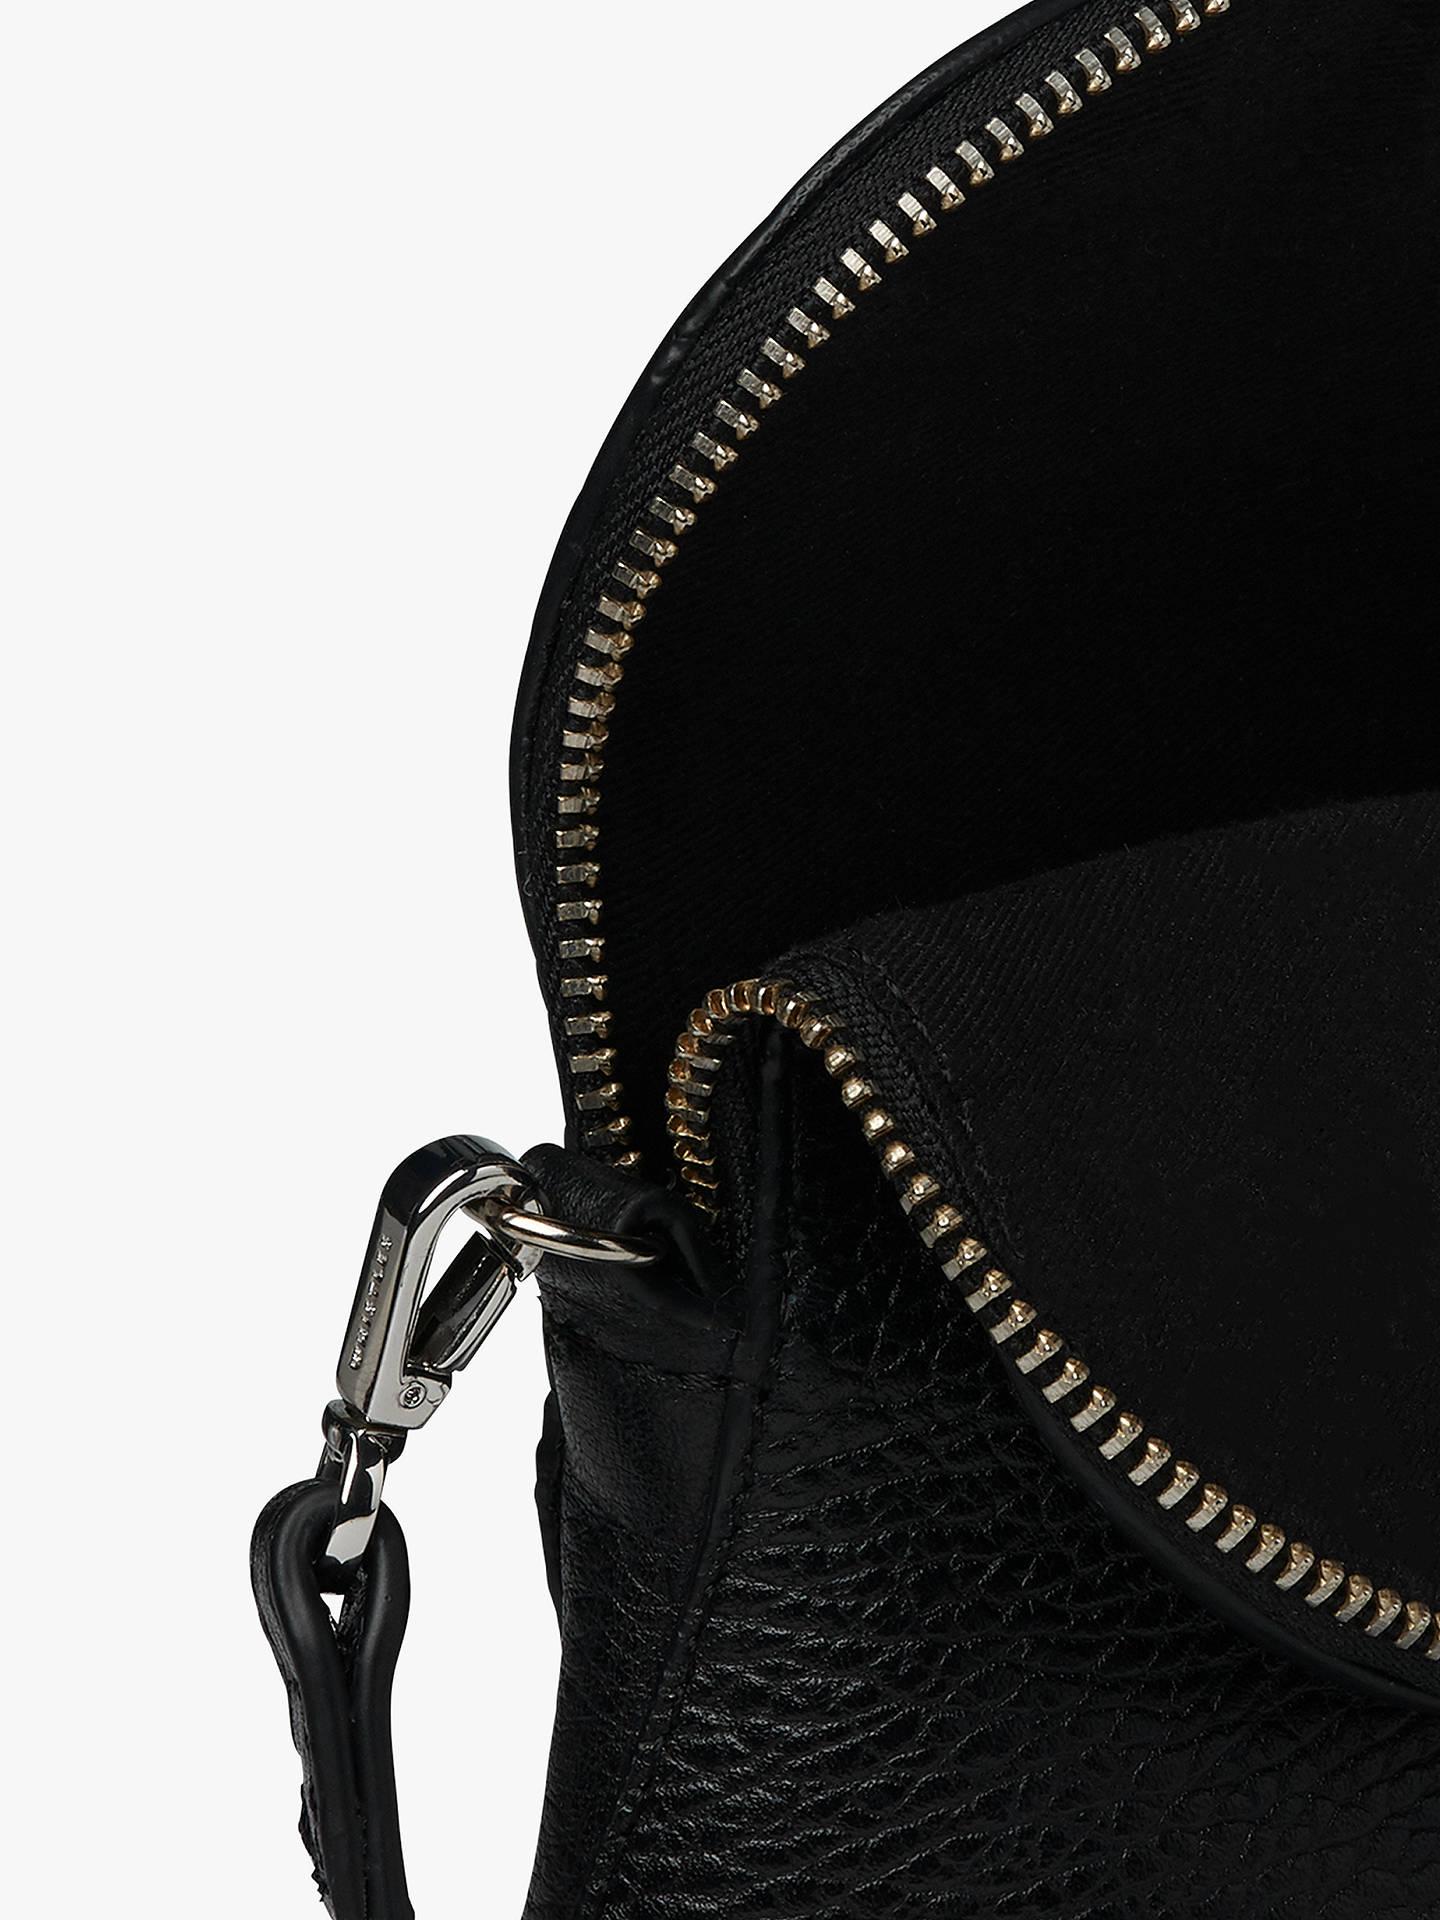 7f9c37a5eb78 ... Buy Whistles Victoria Mini Cross Body Bag, Black Online at johnlewis.com